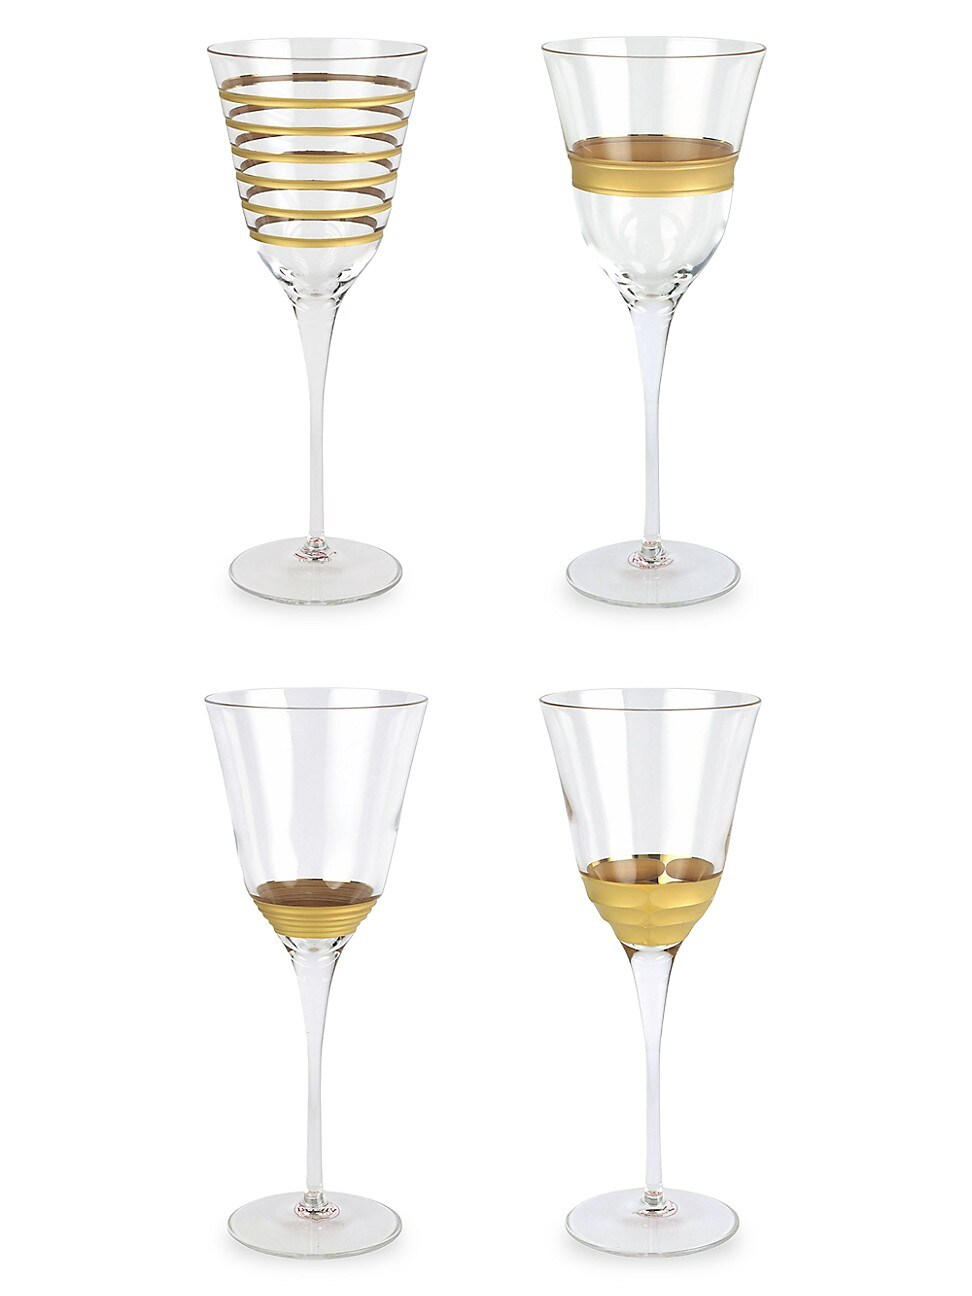 Vietri Clothing RAFFAELLO 4-PIECE ASSORTED WINE GLASS SET